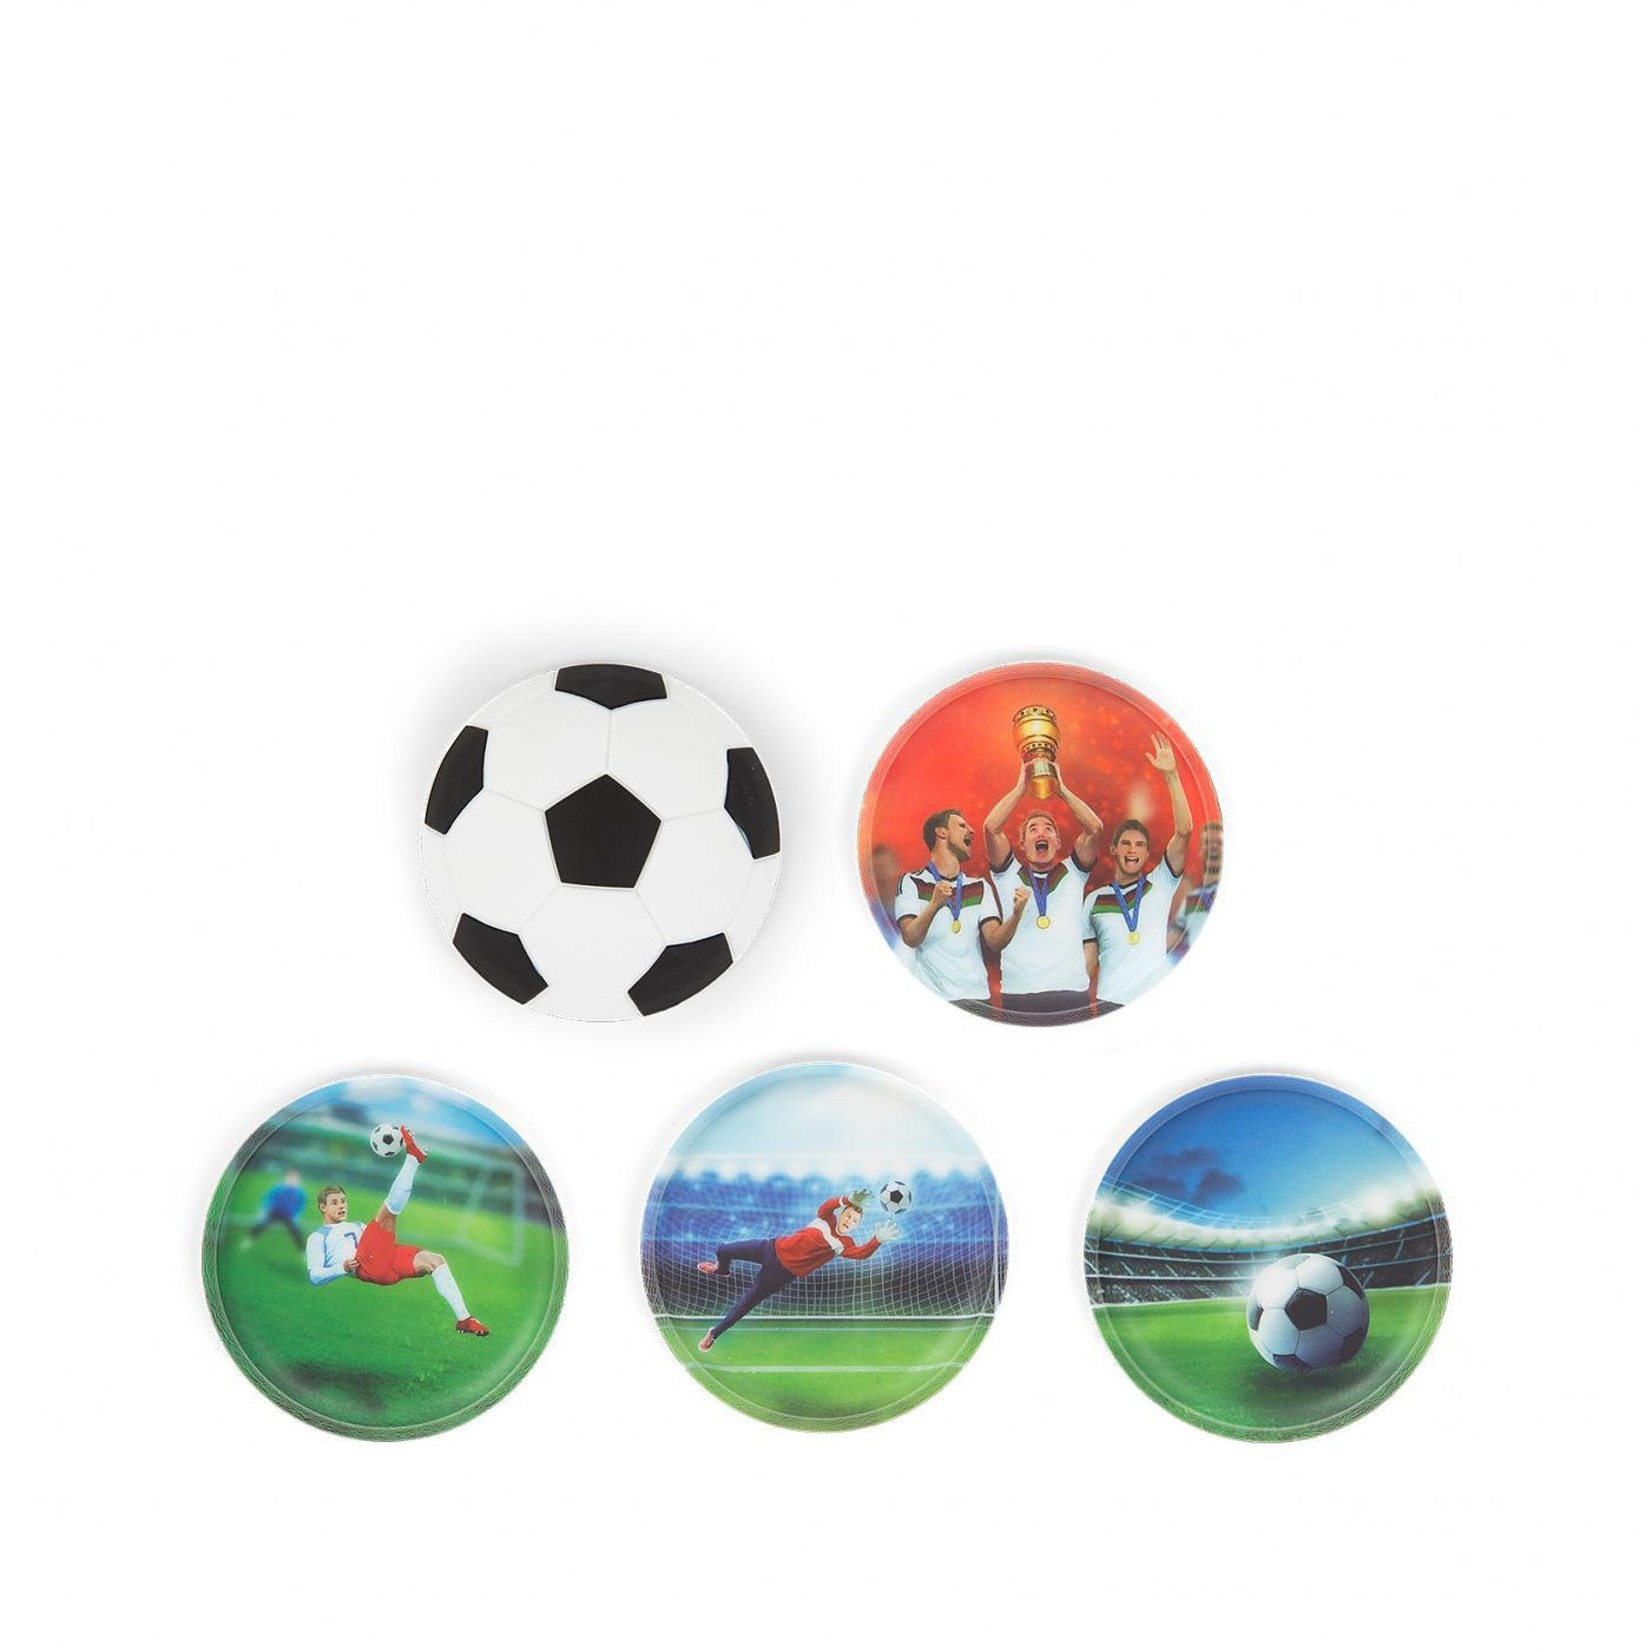 ERGOBAG KLETTIES SPECIAL EDITION 5Stk FUSSBALL